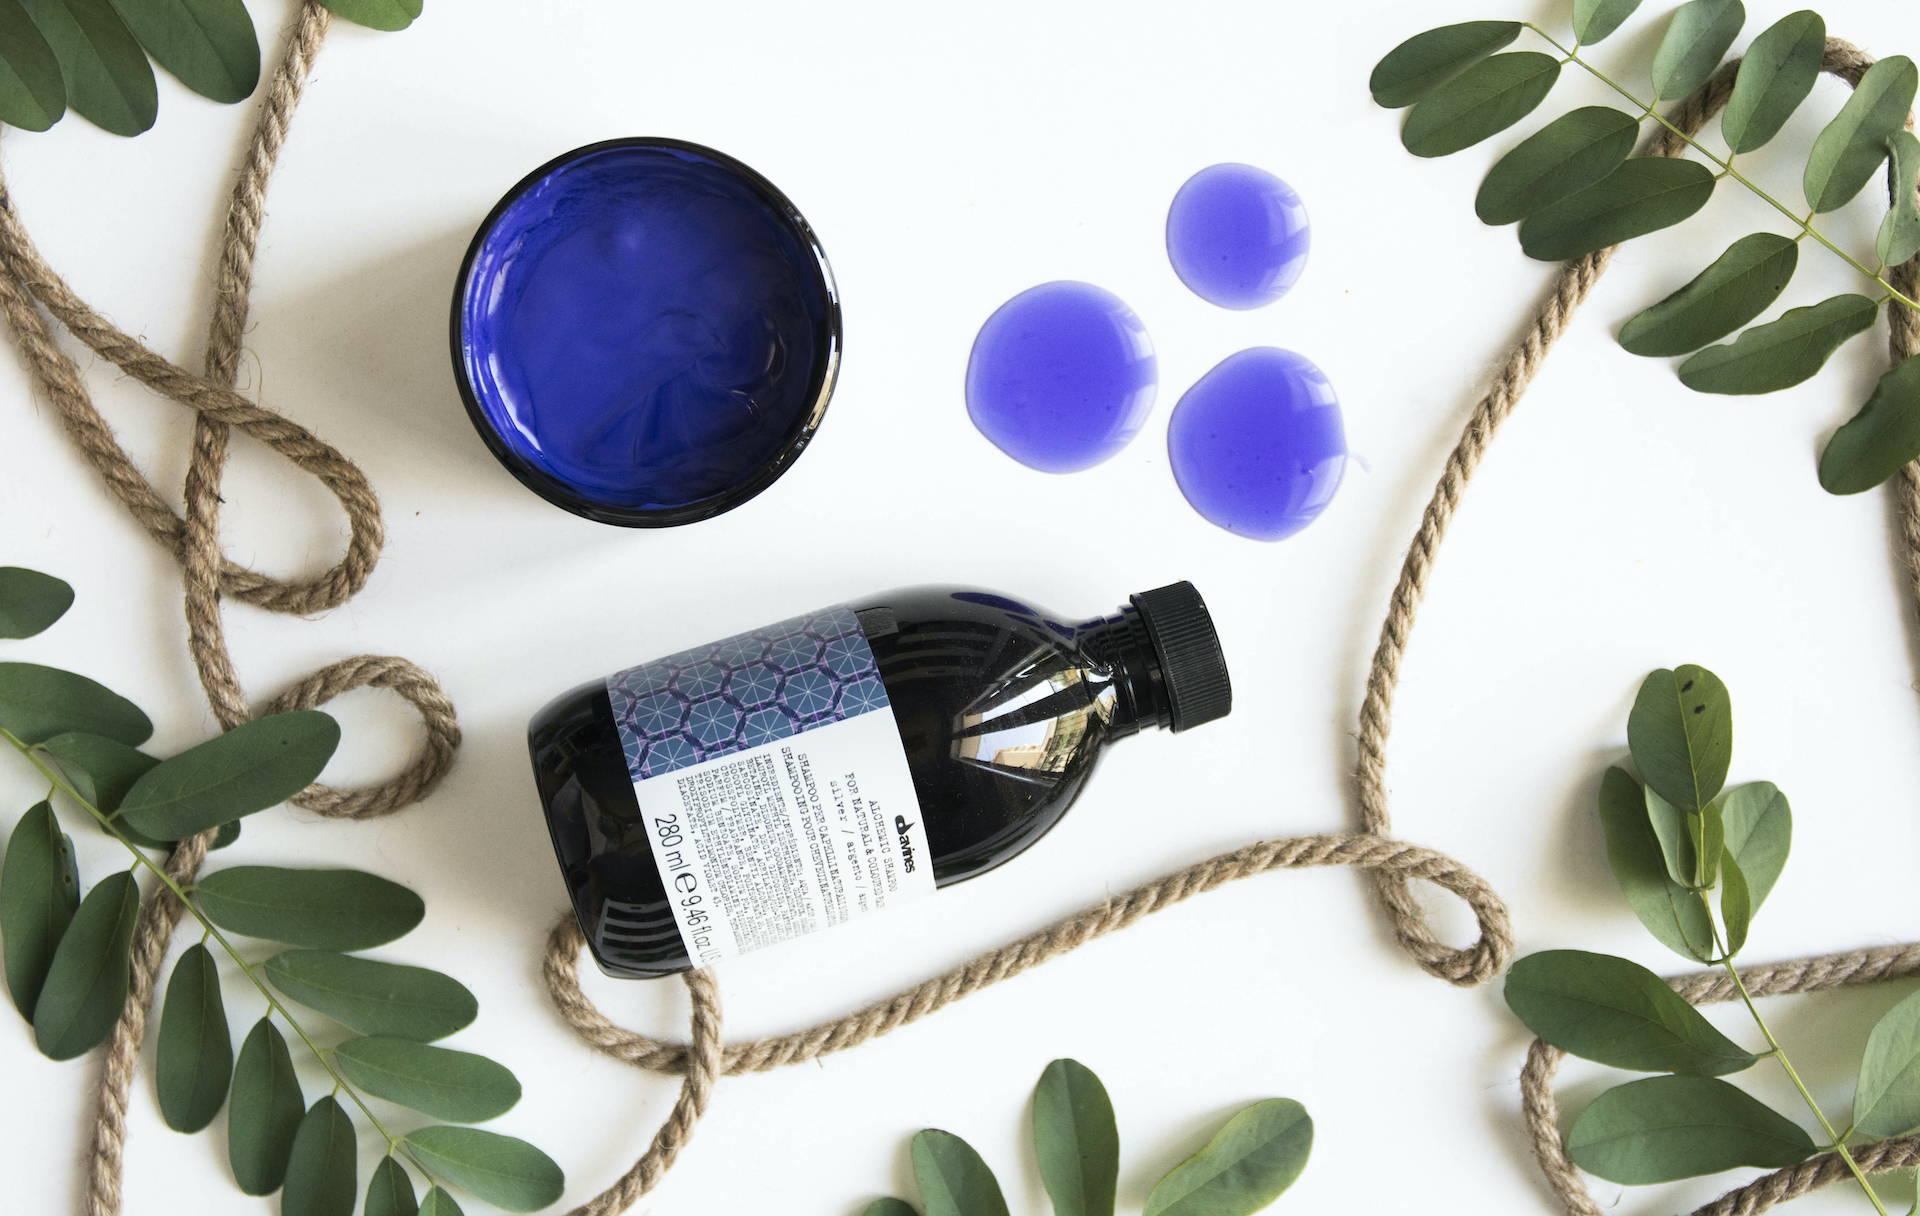 Davines Alchemic Silver purple shampoo